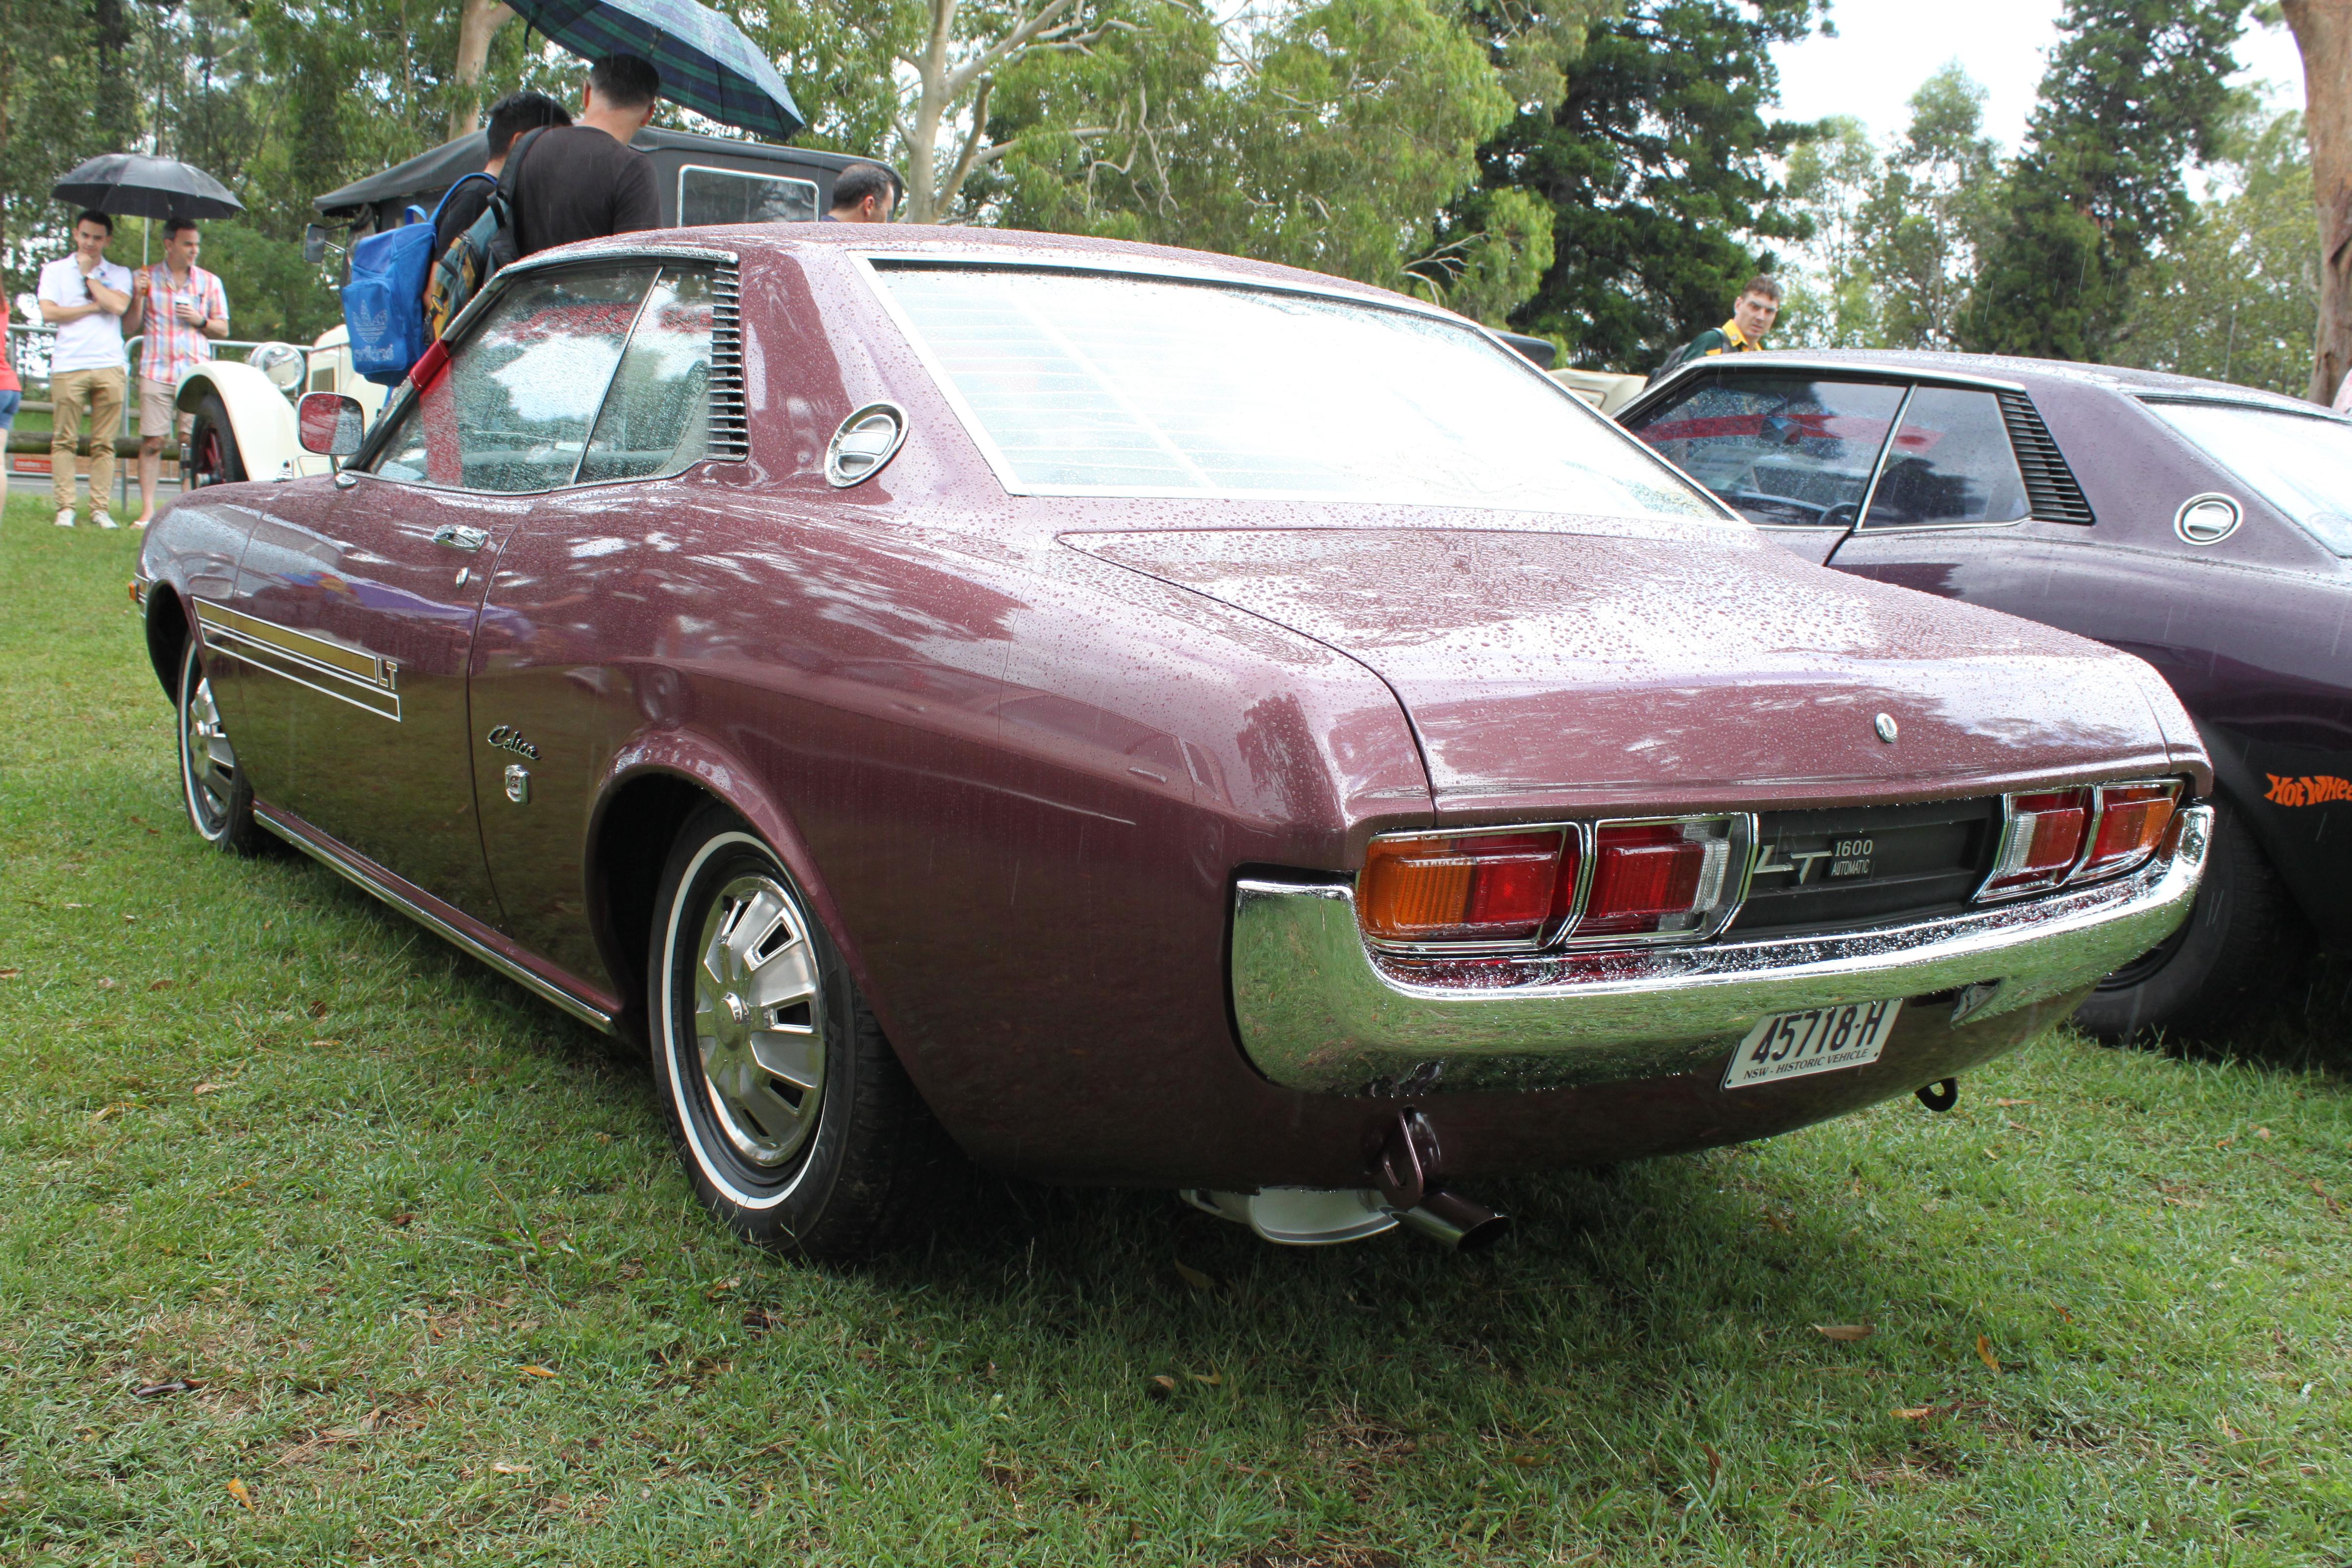 Toyota Celica 2016 >> File:1972-1975 Toyota Celica (TA22) LT coupe (25211941985).jpg - Wikimedia Commons